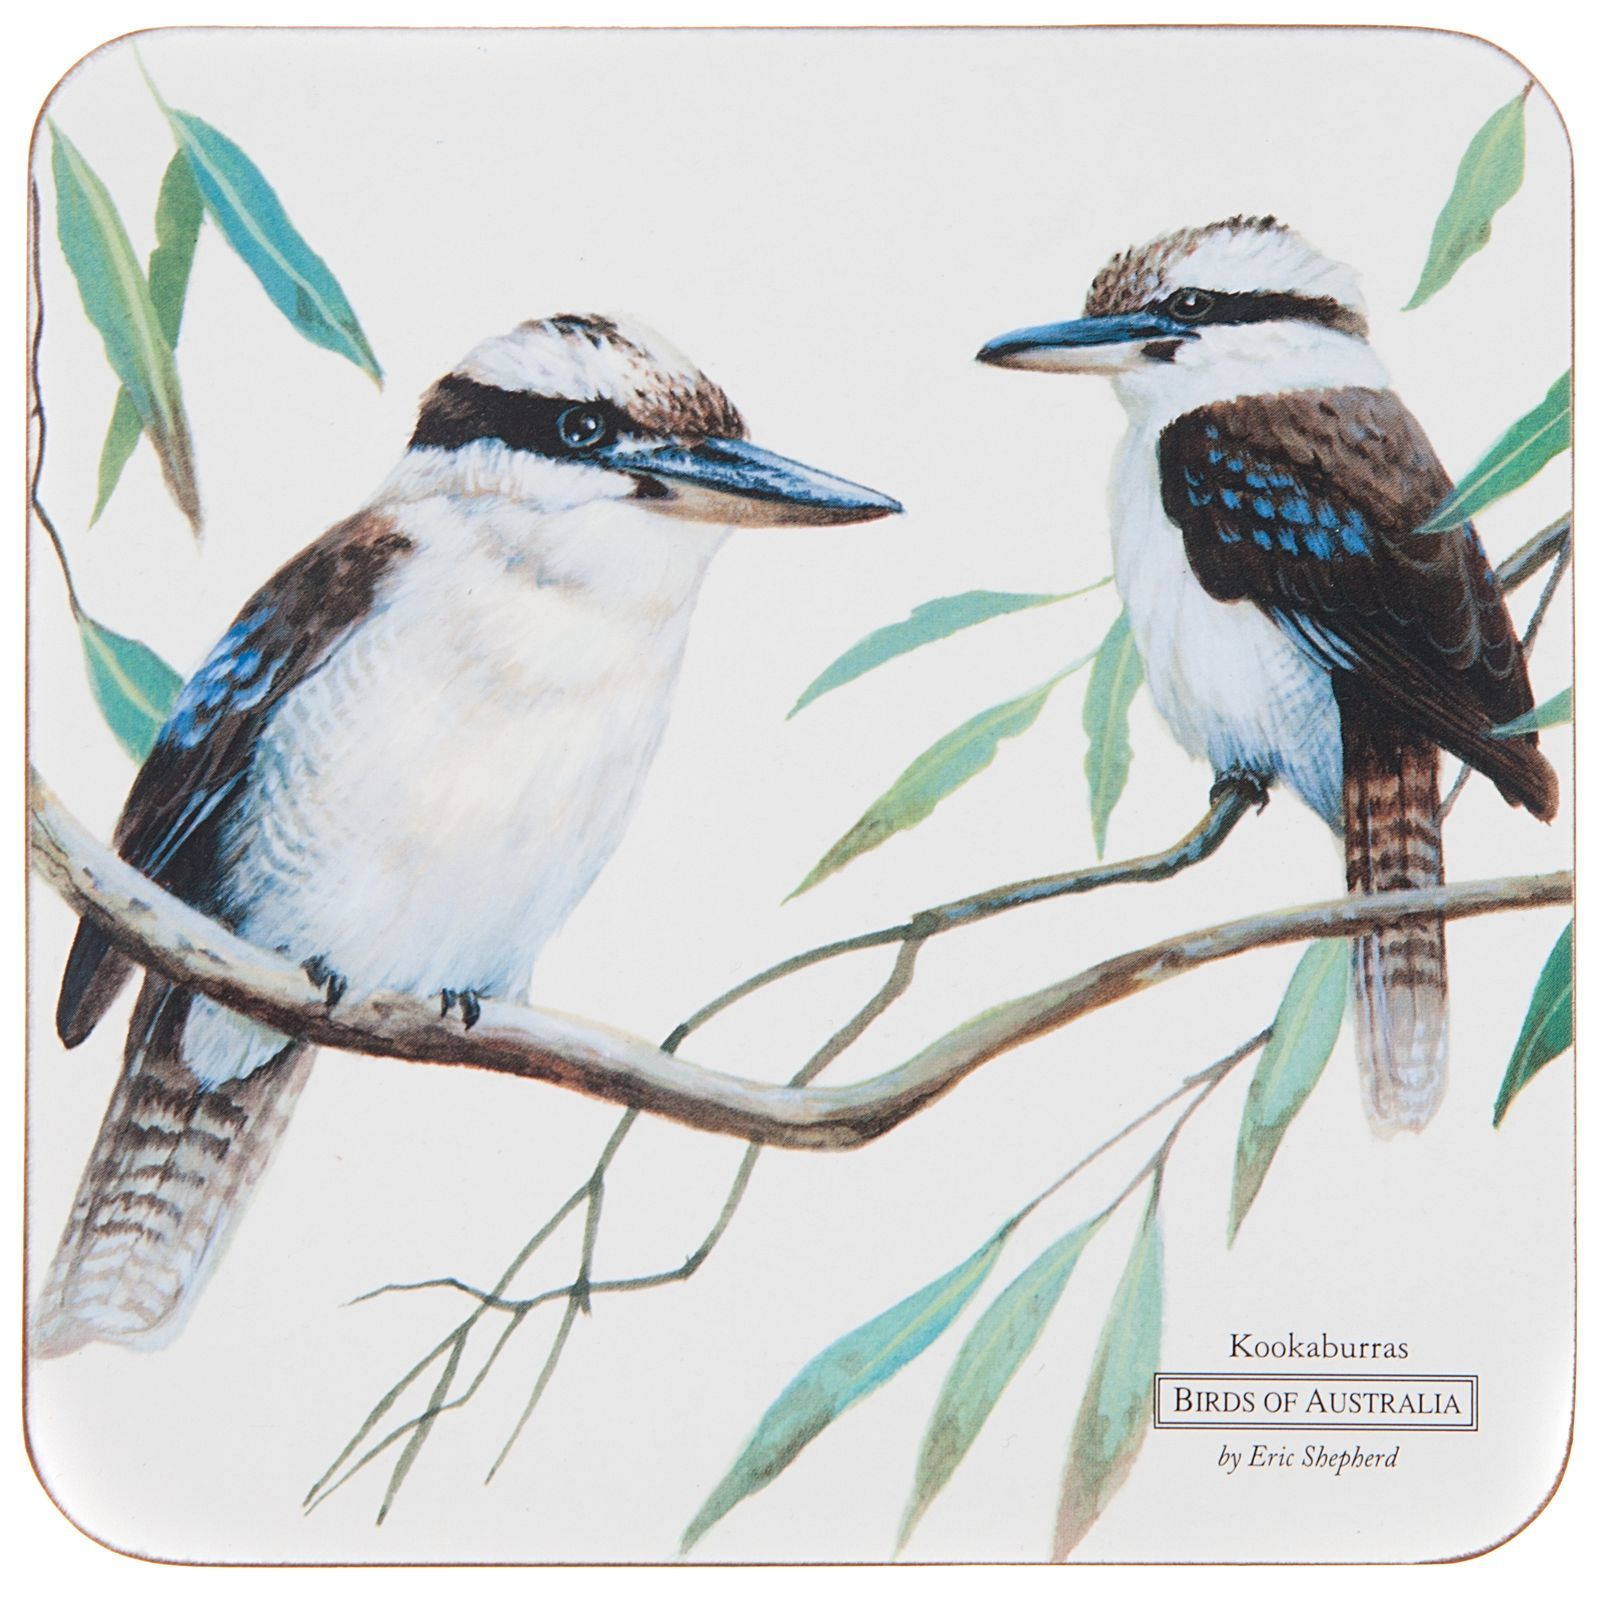 Premise Indicator Words: Eric Shepherd Birds Of Australia